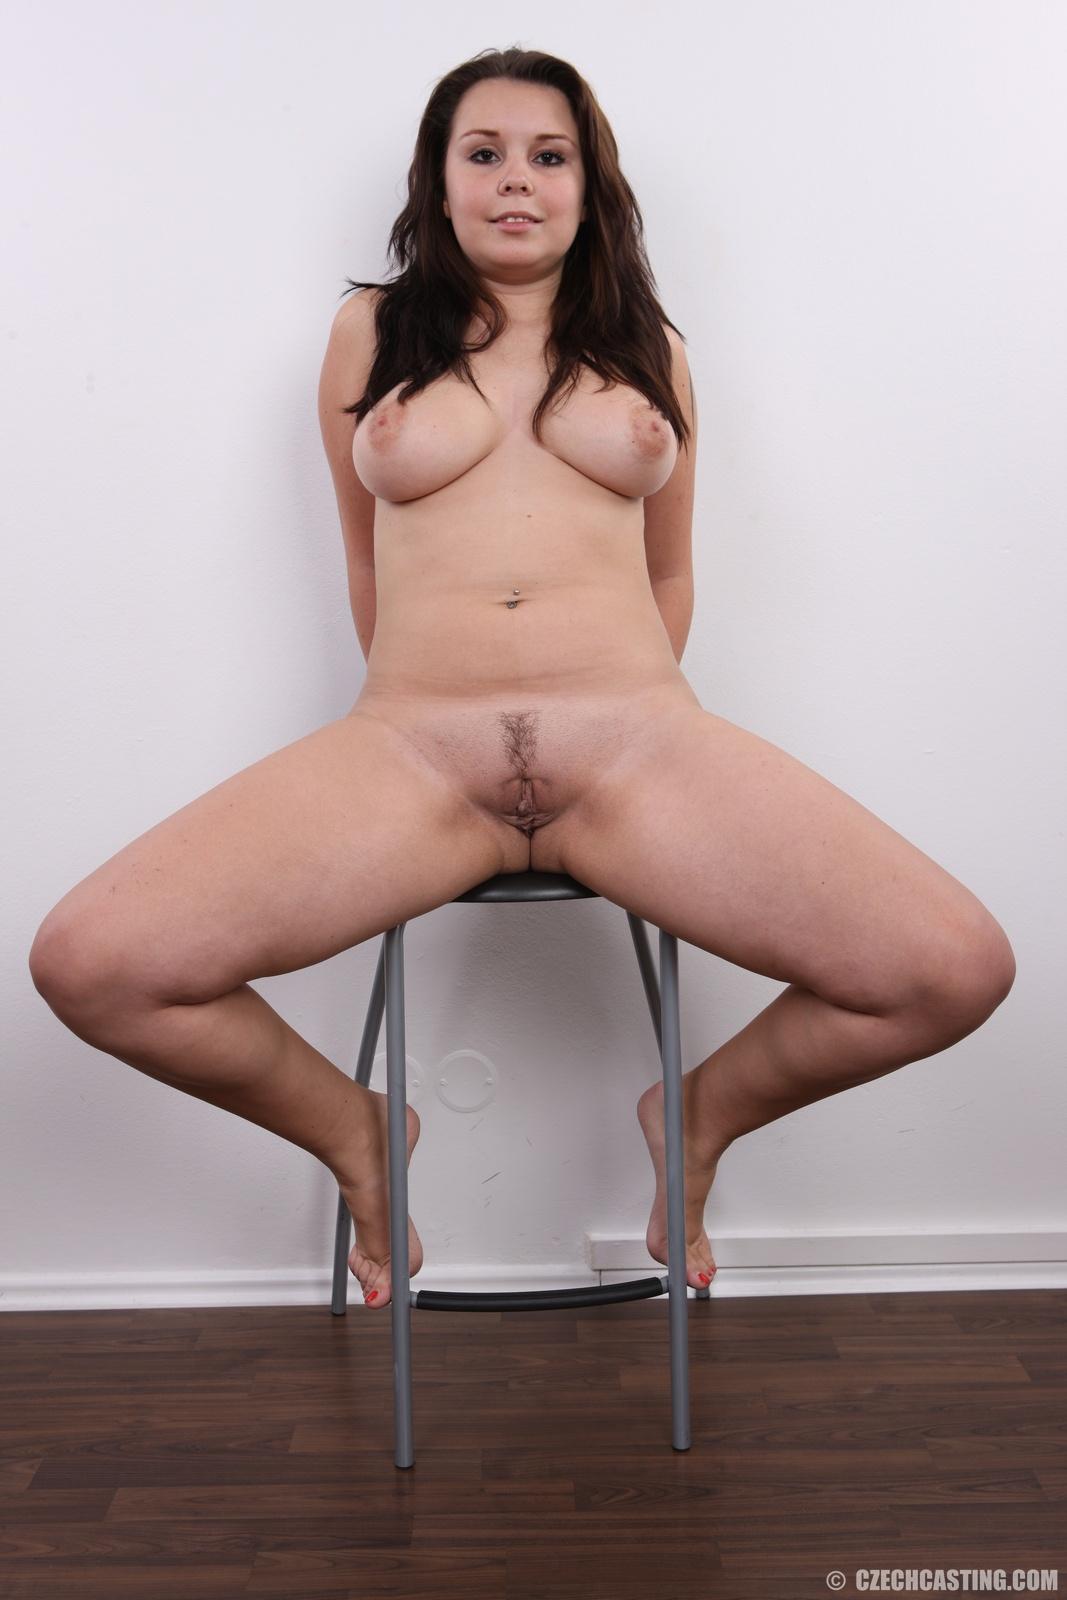 Actrices Porno Voluptuosasdesnudas mujeres desnudas que no son actrices porno - poringa!